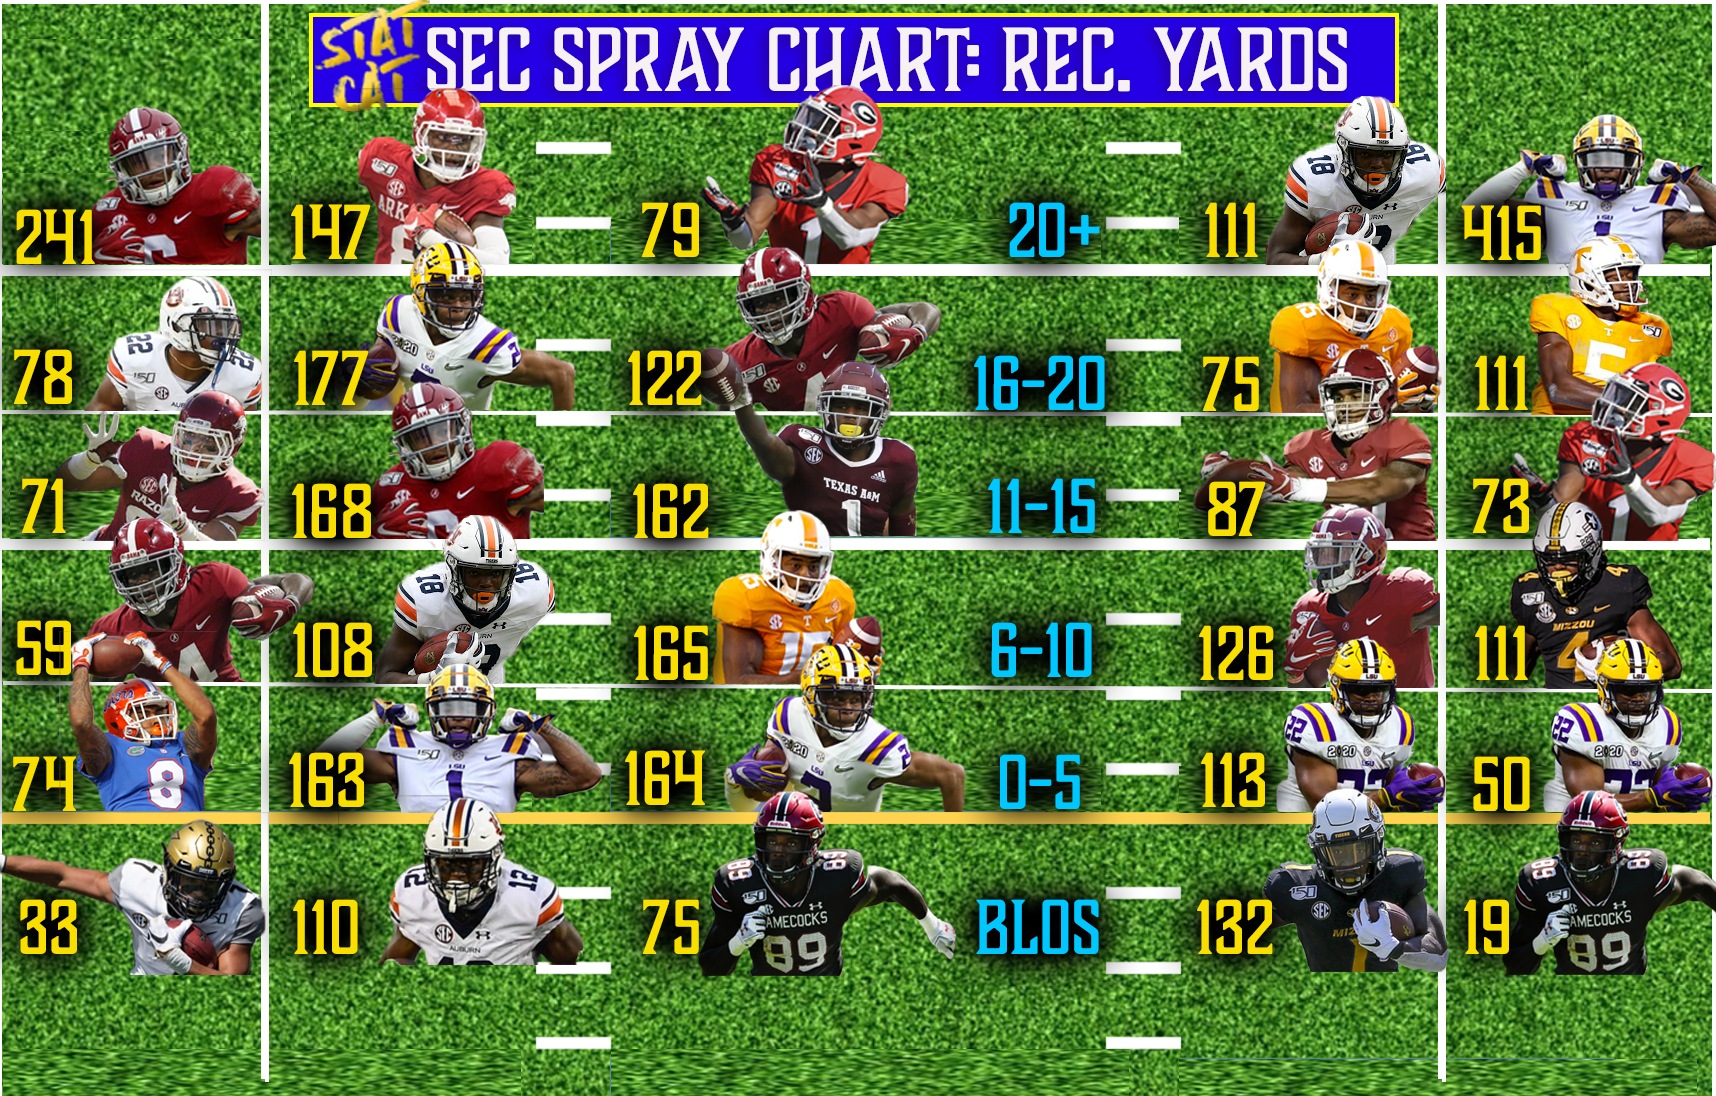 2019 Spray Chart: Catcher Yards